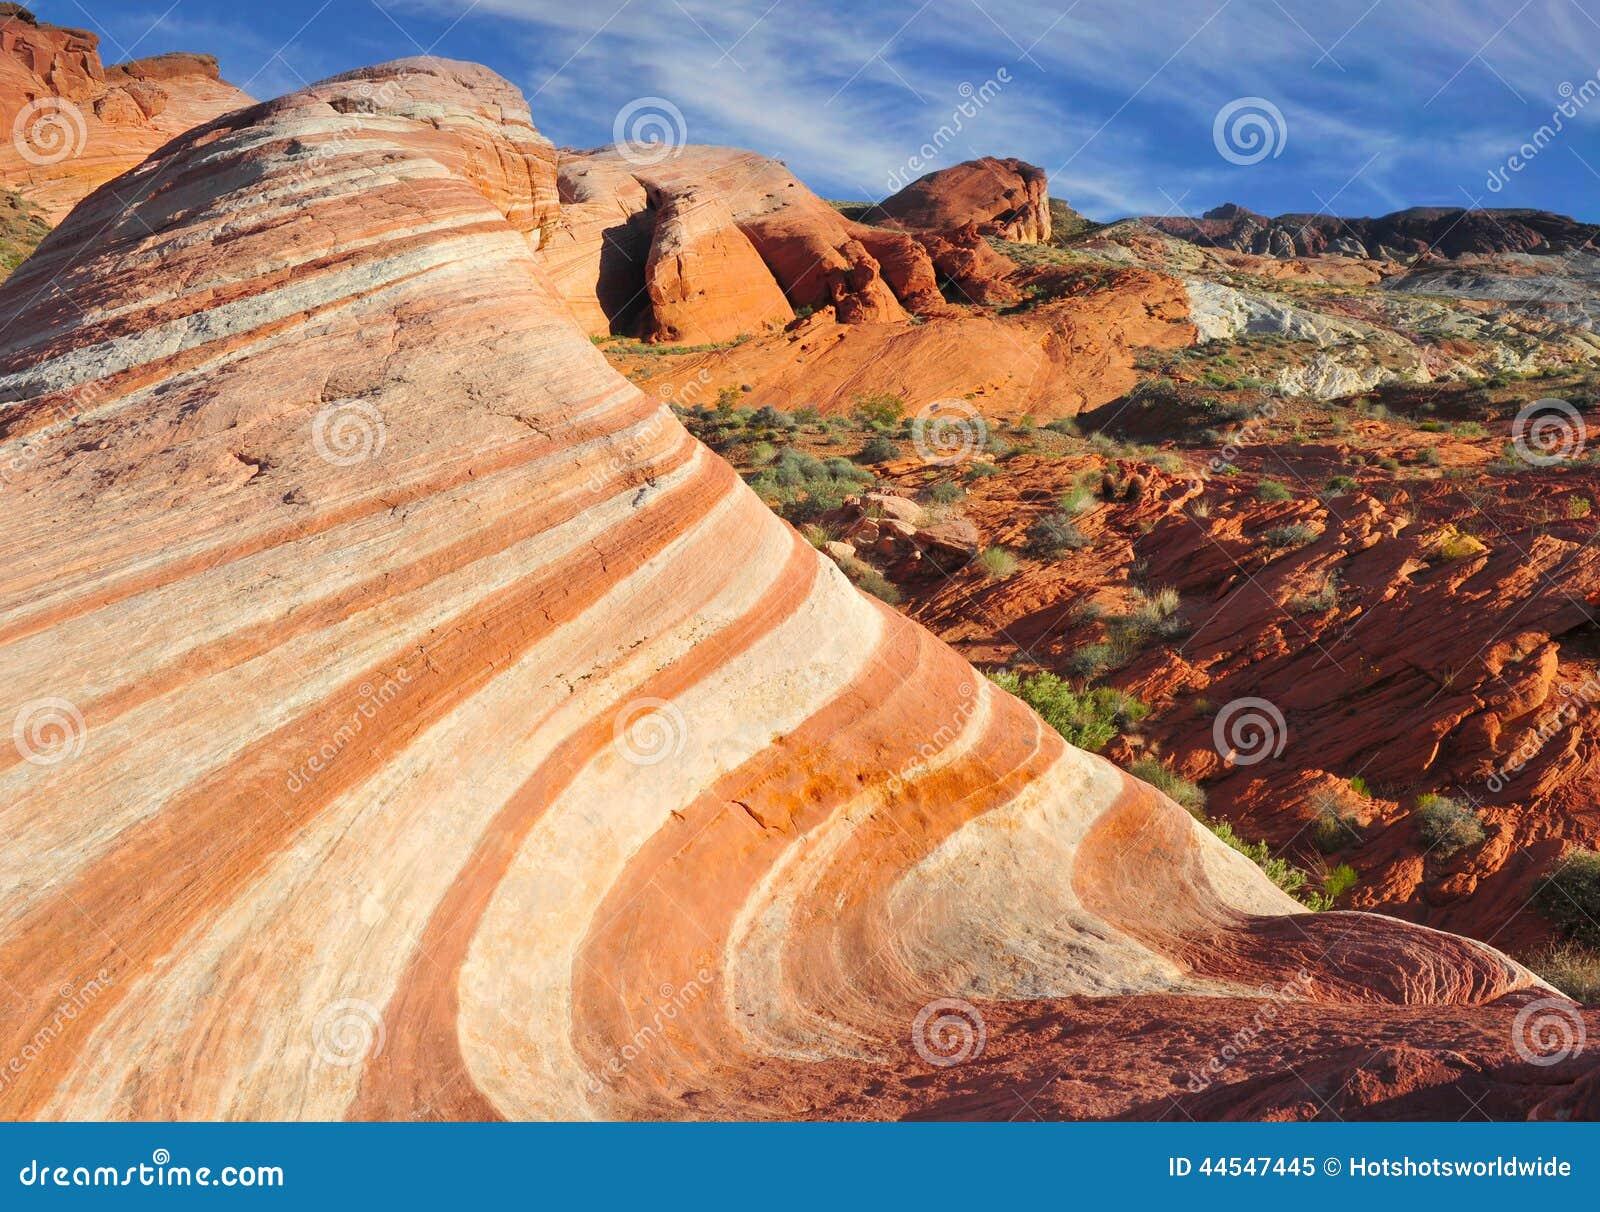 ... , Las Vegas, Nevada. redrock arid landscape desert under blue sky